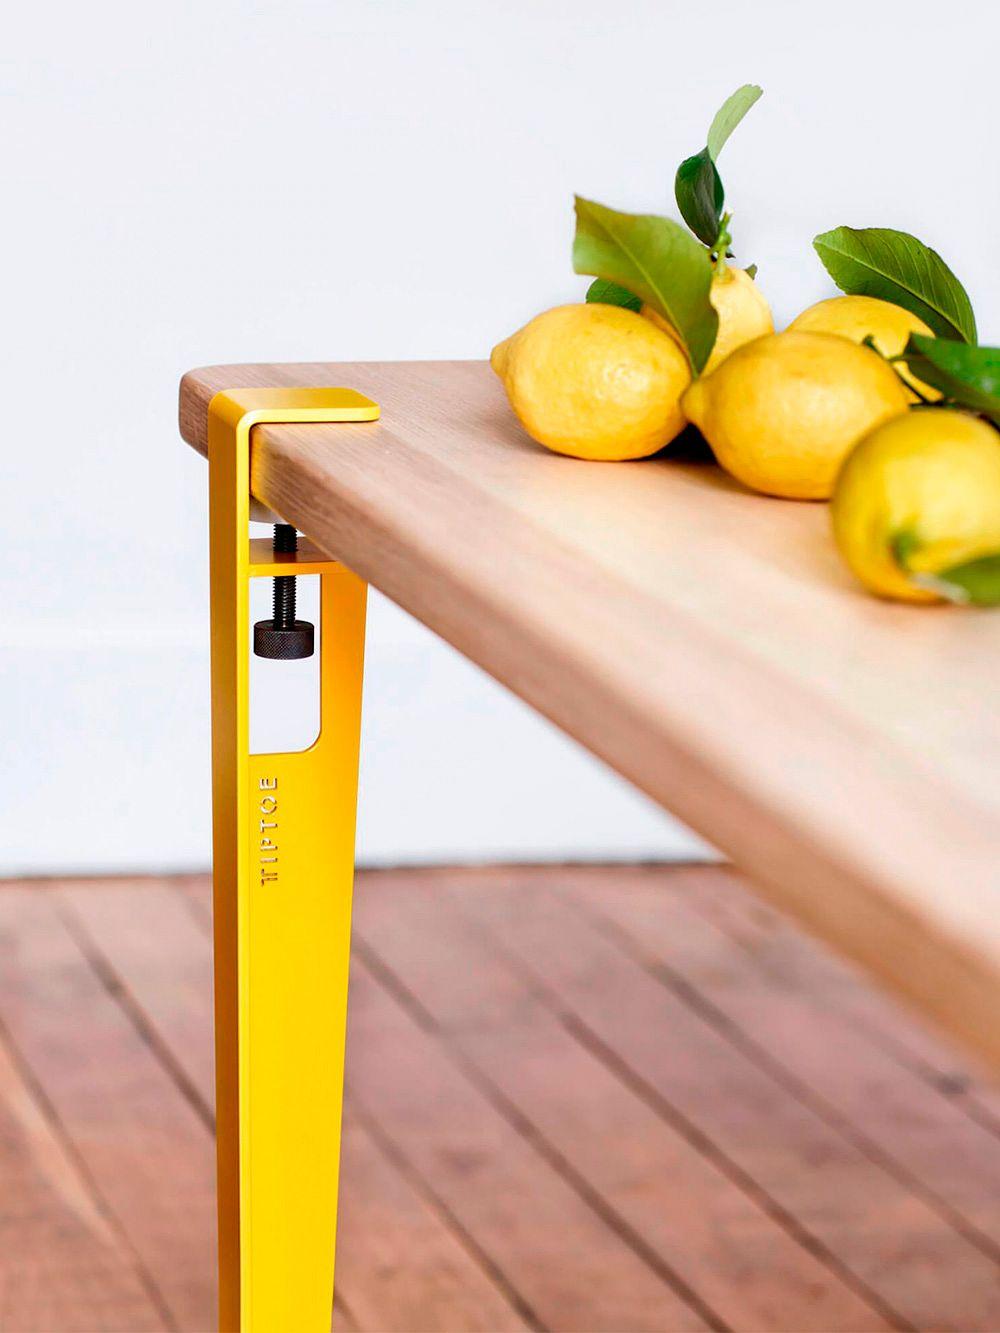 Tiptoen pöydänjalka